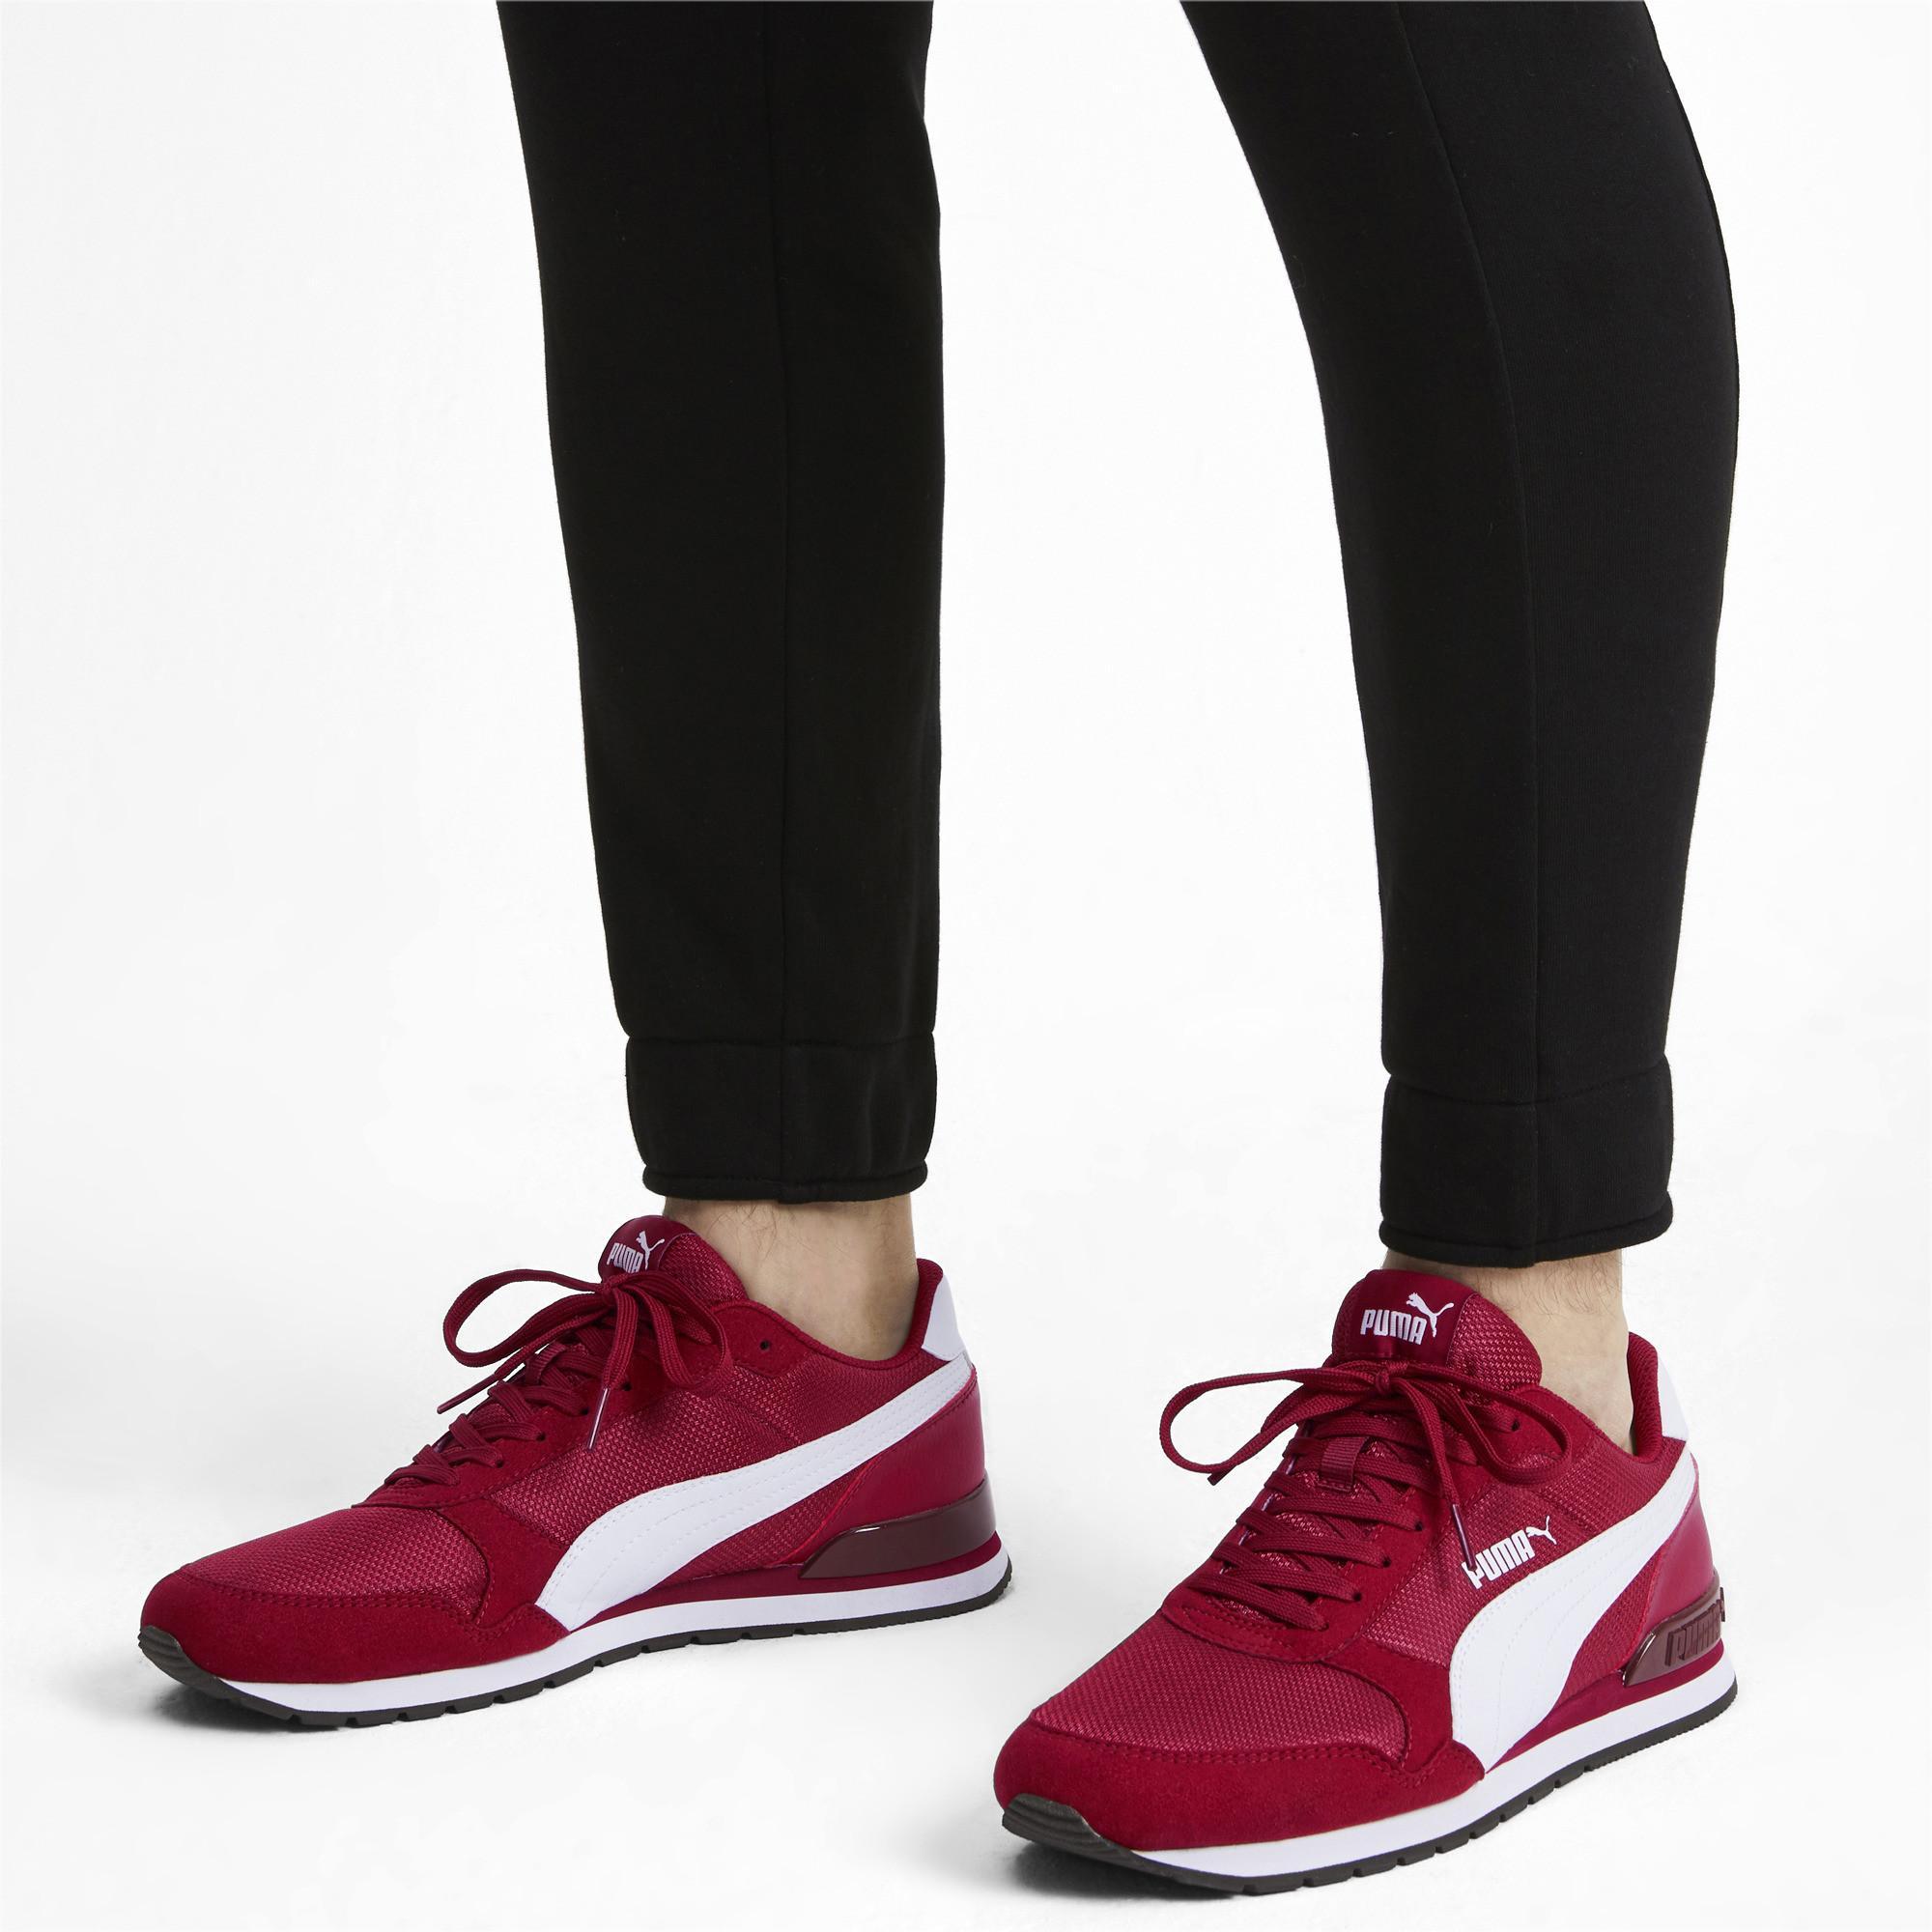 PUMA Suede St Runner V2 Mesh Sneakers